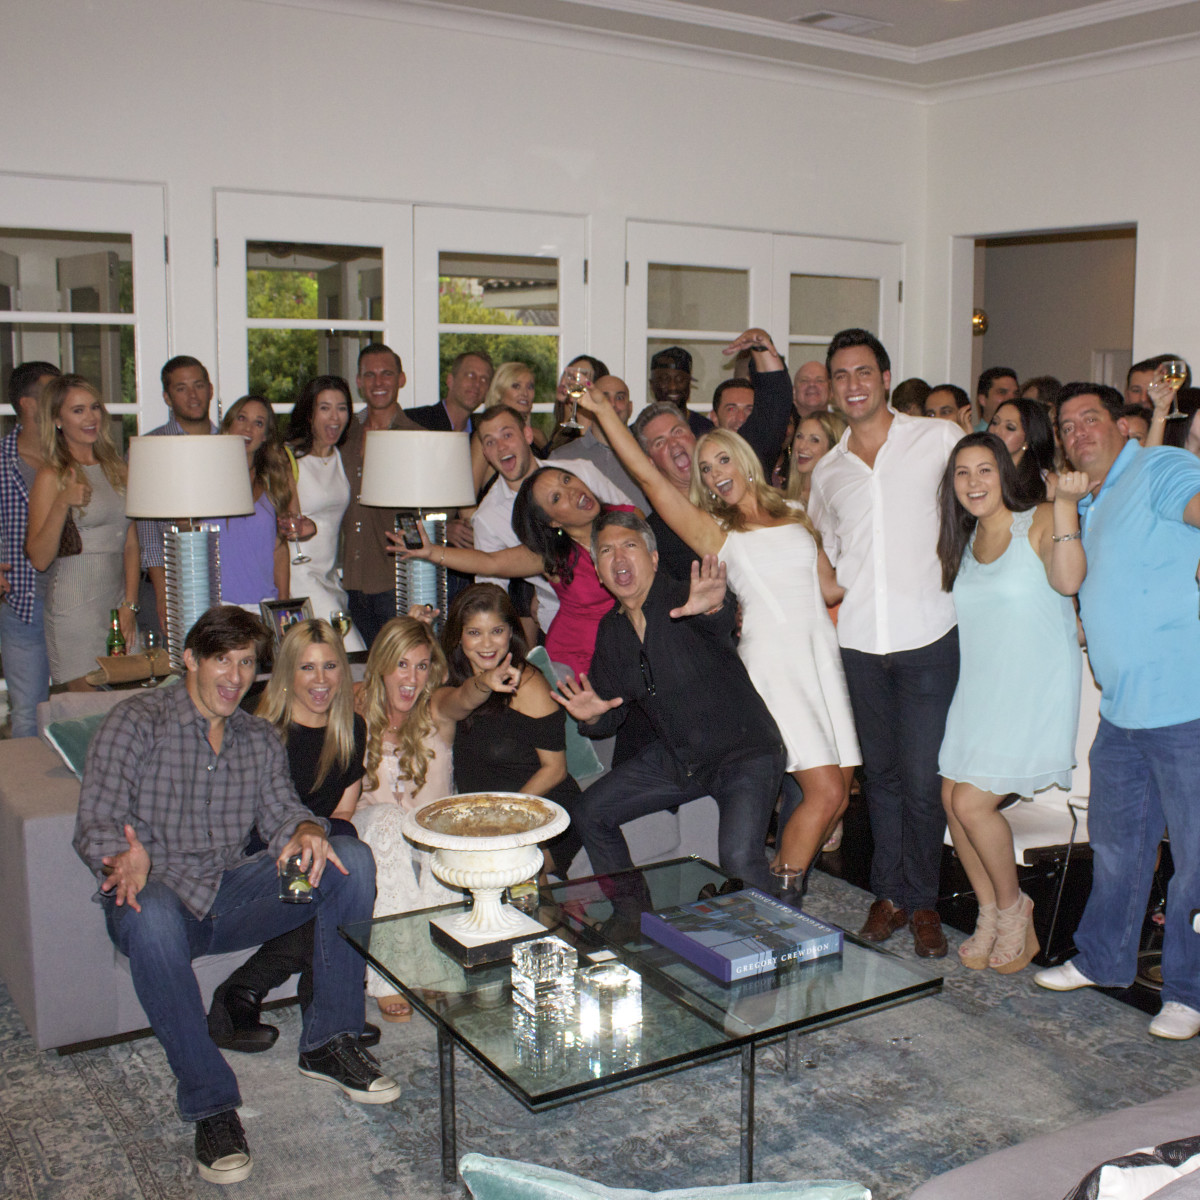 Houston, Chita Johnson engagement party, July 2015, group photo